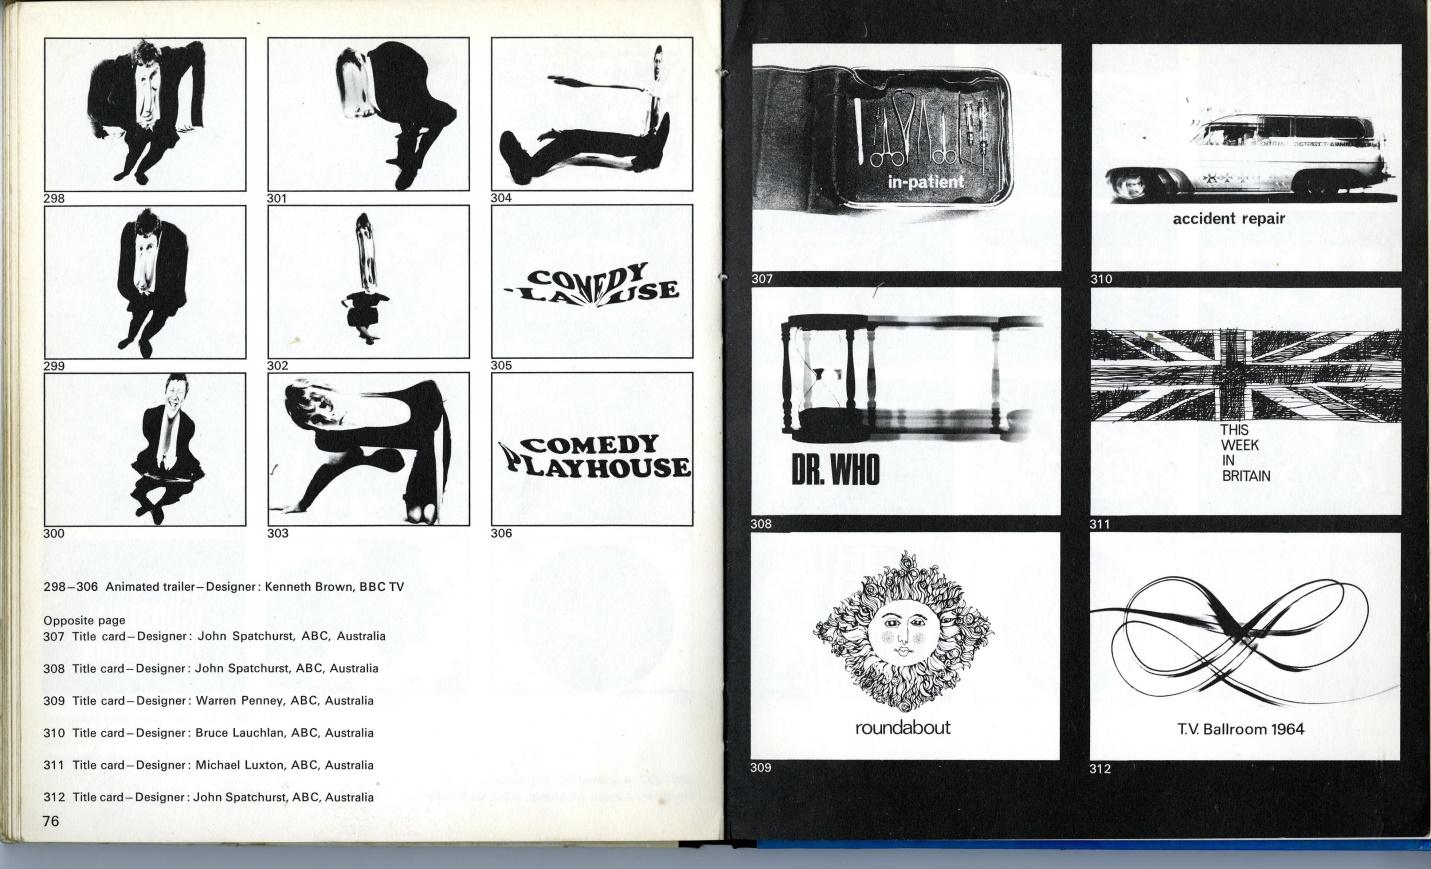 Studio Vista/Reinhold Art, TV Graphics by Roy Laughton (ed. John Lewis), Title Card for Dr. Who used on ABC Australia - Designer: John Spatchurst